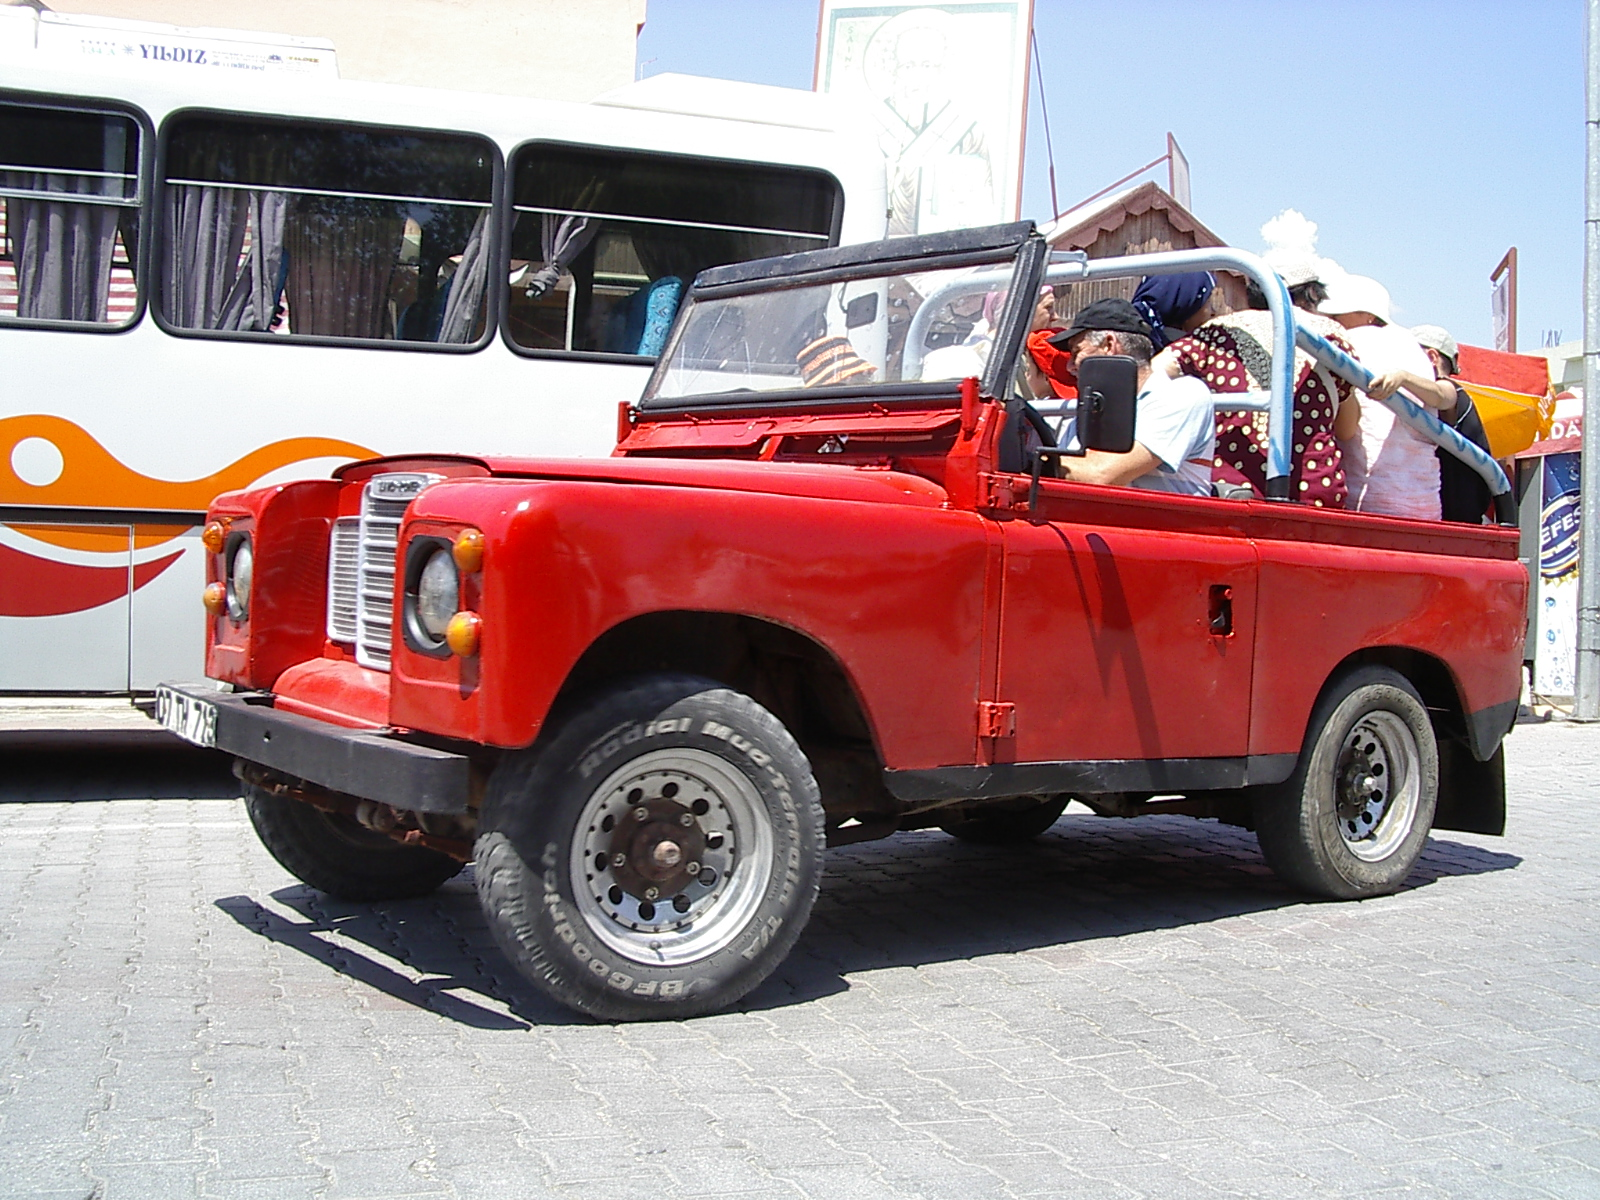 j_d red jeep truck car all terrain vehicle